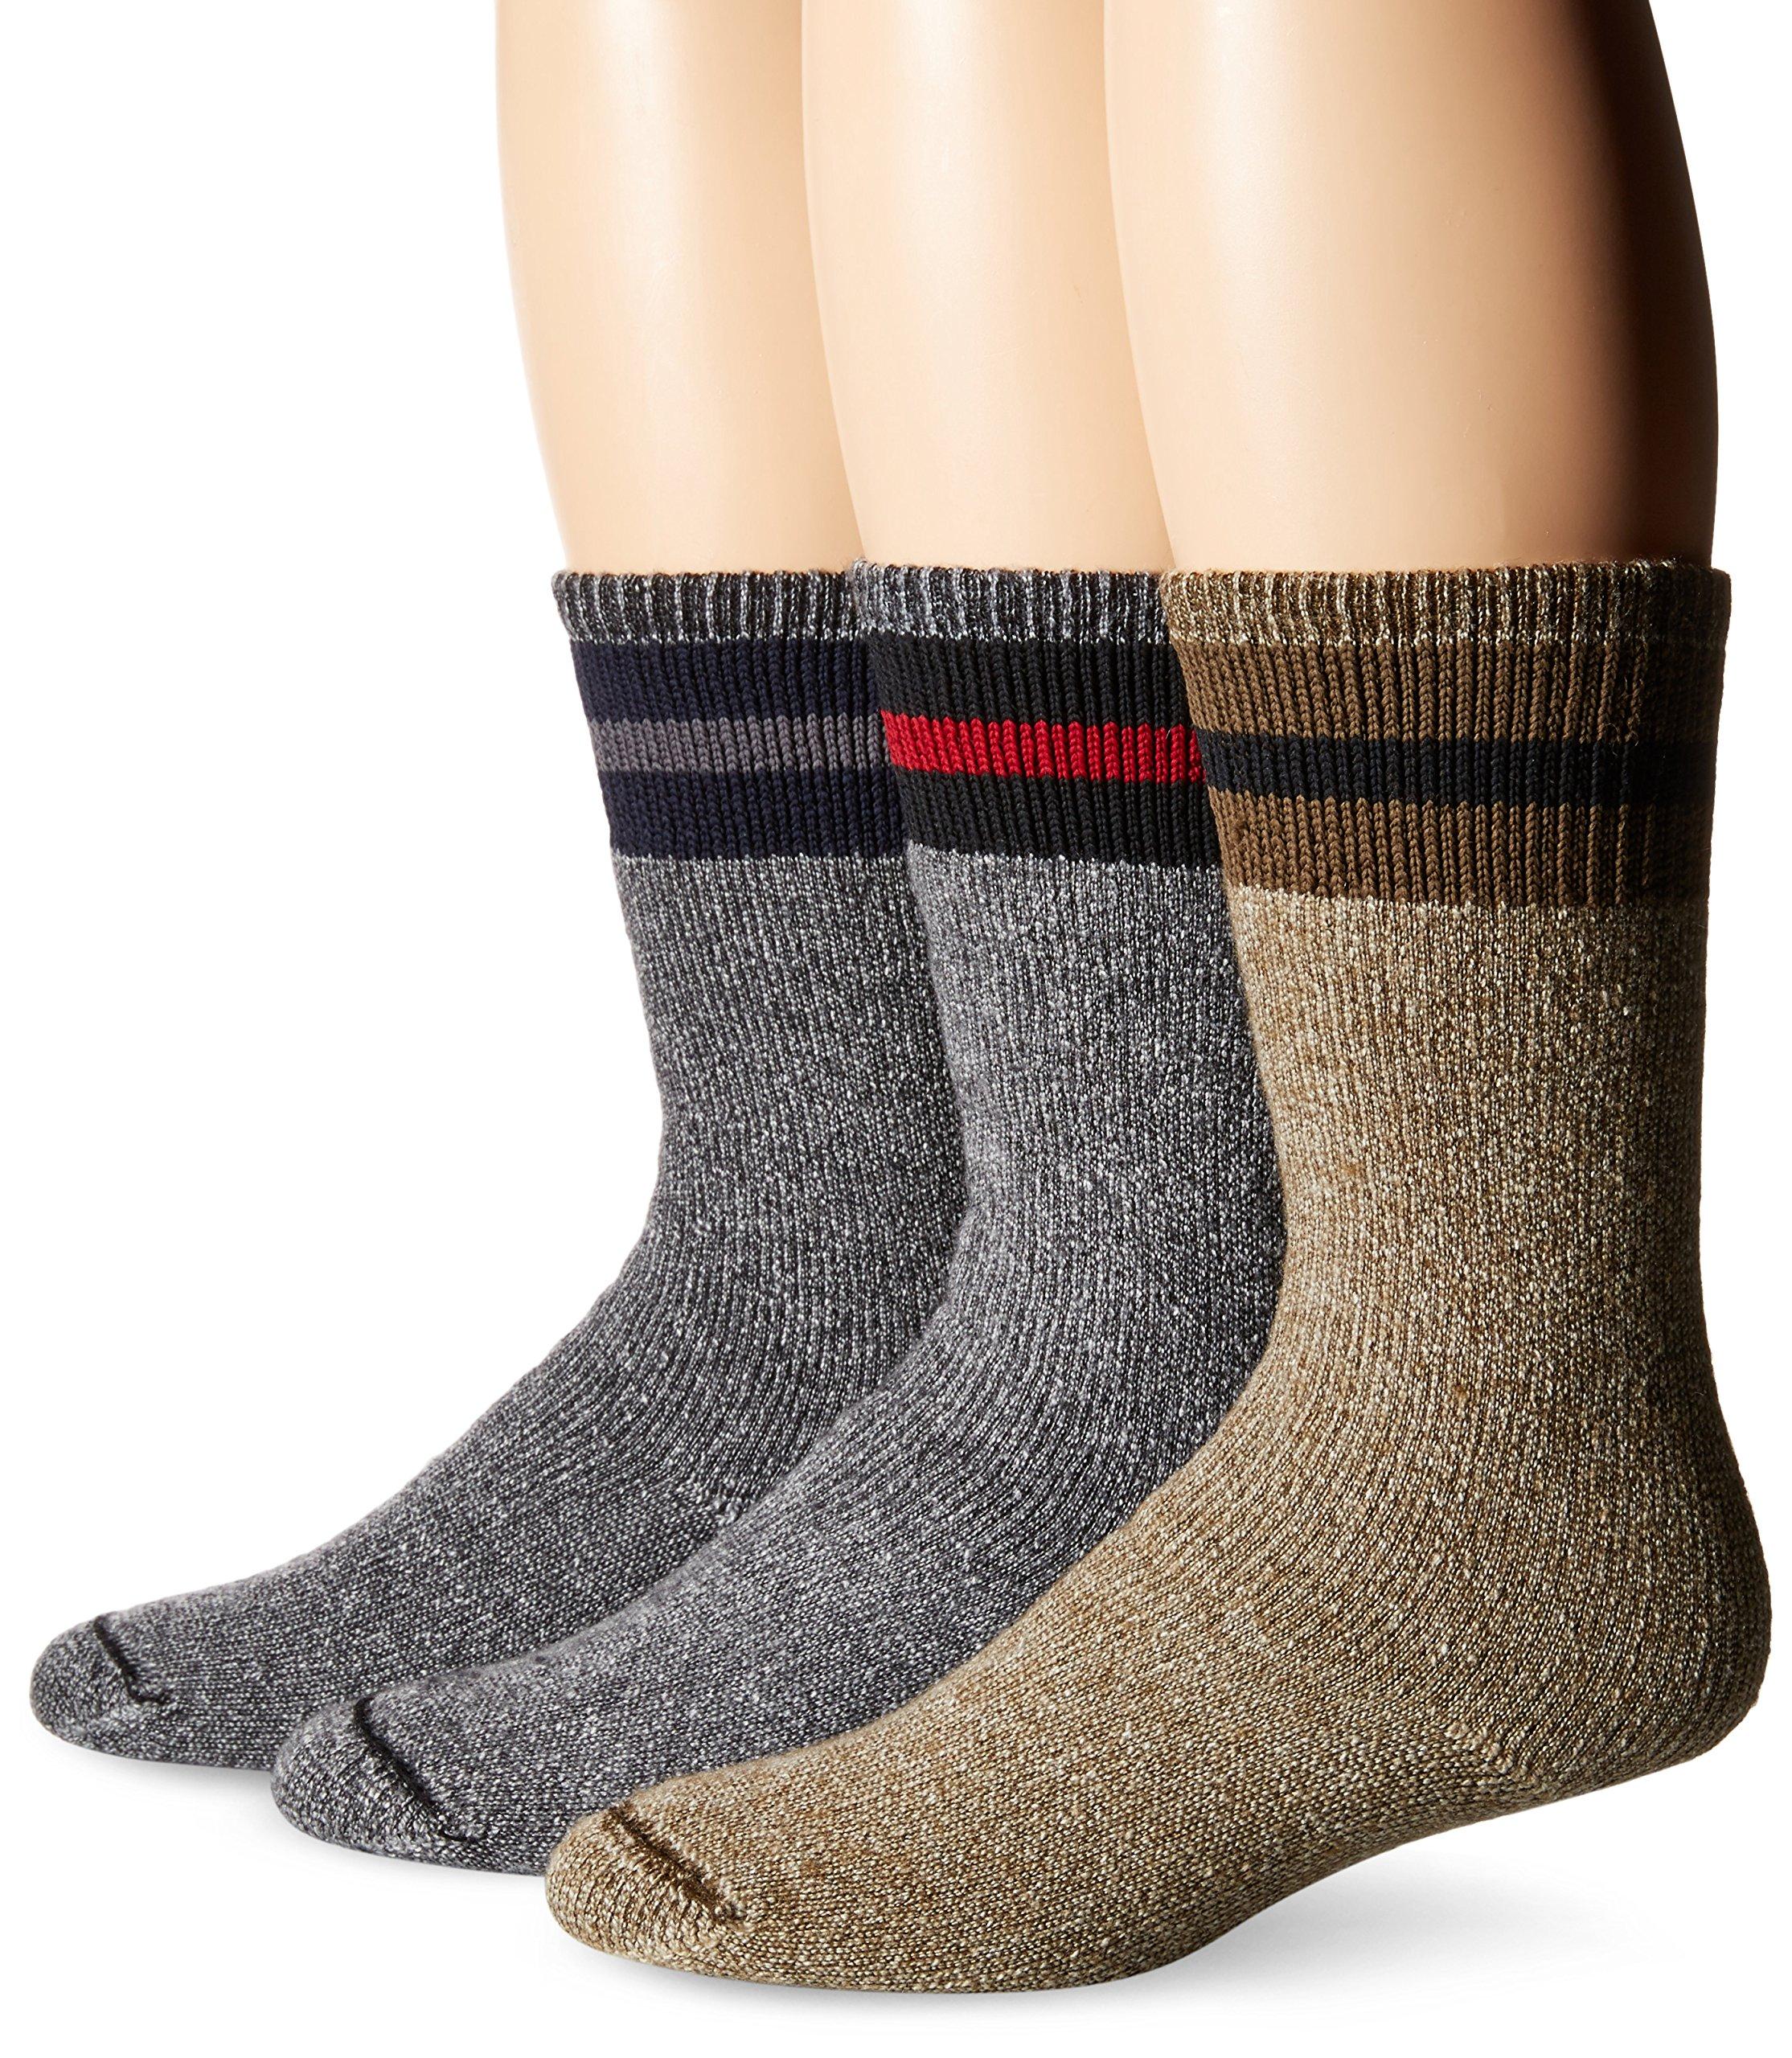 Wigwam Men's American Wool Boot Sock,Navy/Grey/Brown/Black/Red,Medium/shoe Size : Men's 5-9.5,Women's 6-10